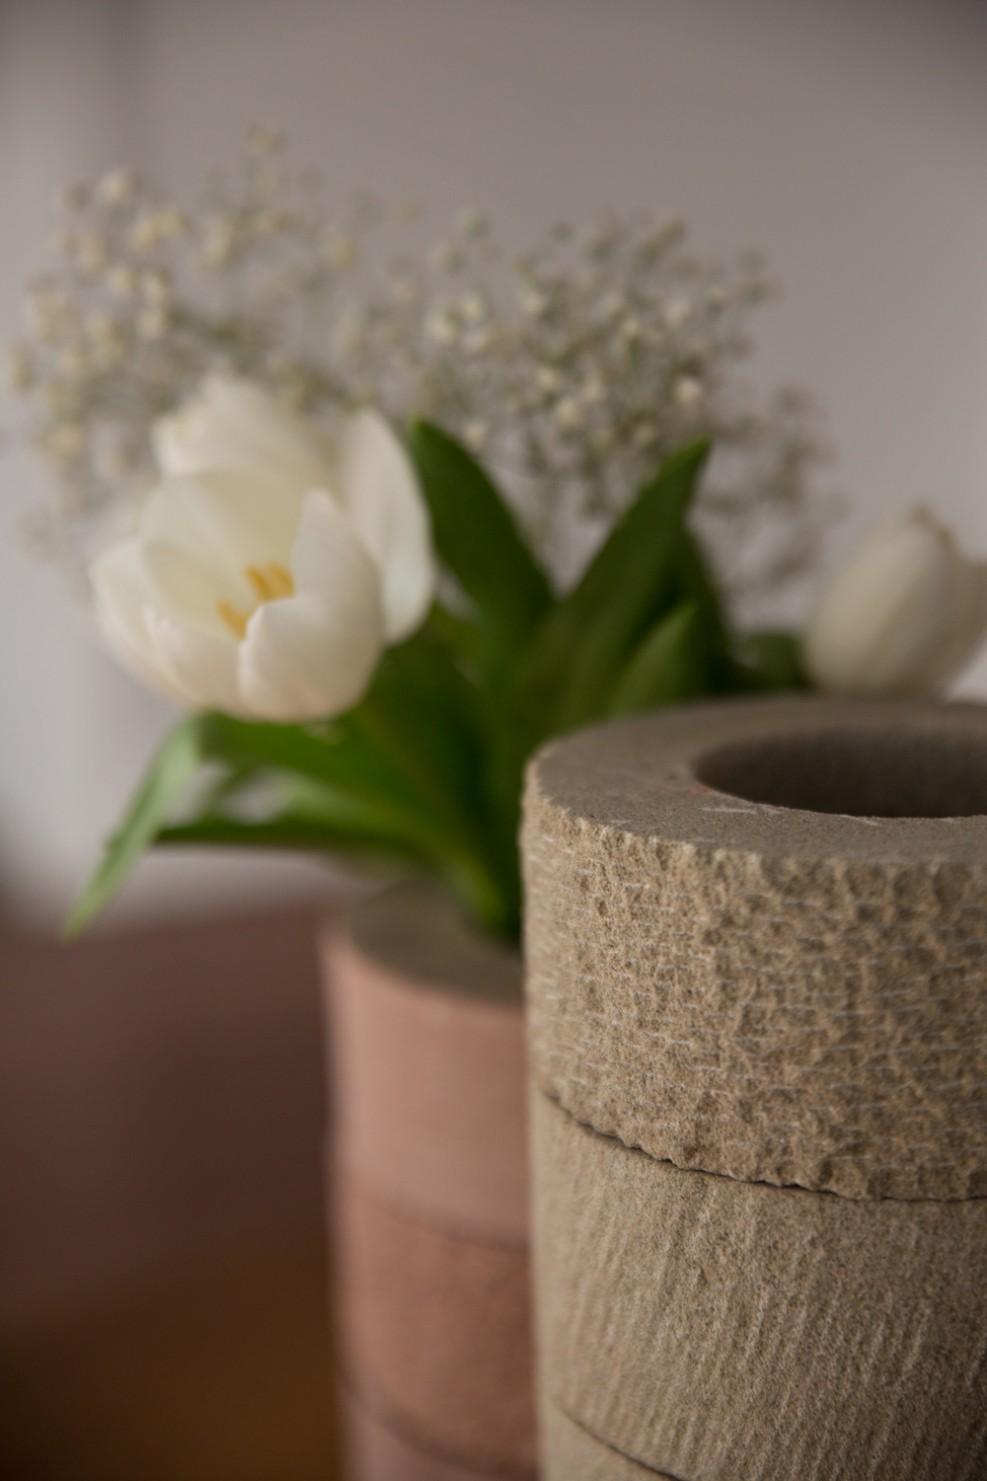 Vase HÀÀFE par Tamim Daoudi sur Design Maroc